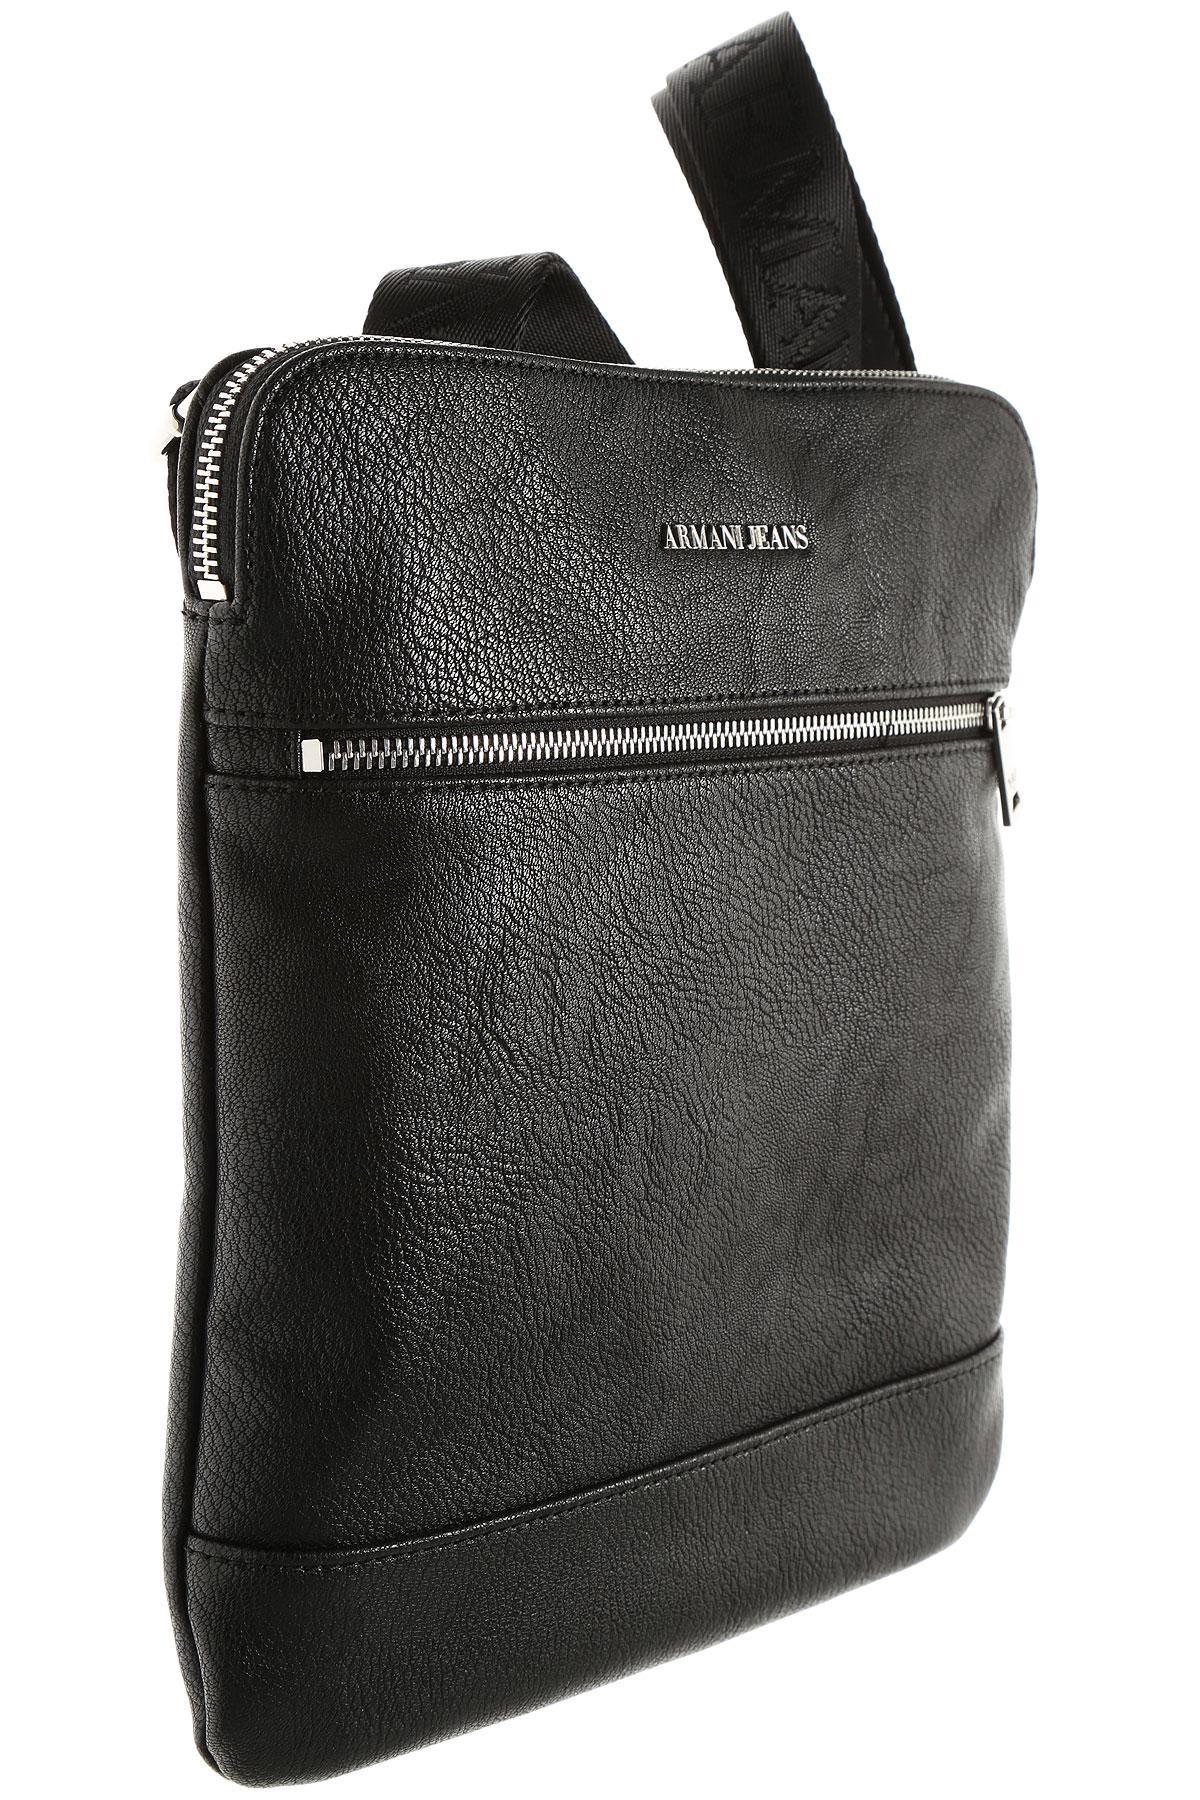 24d512768fc3 Armani Jeans - Black Messenger Bag For Men On Sale for Men - Lyst. View  fullscreen